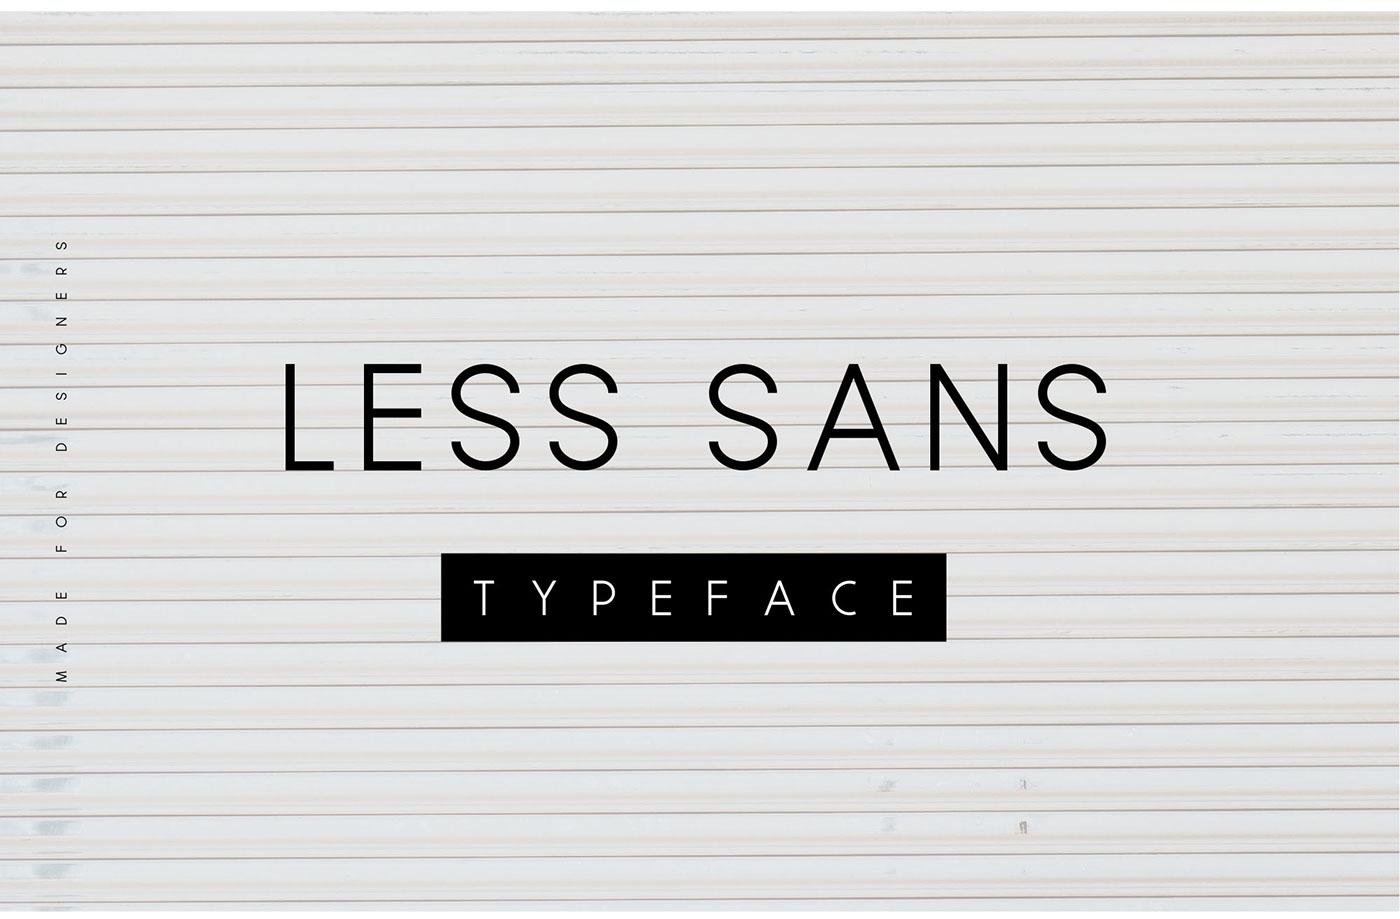 Less Sans Minimal Typeface - Free Download on Behance